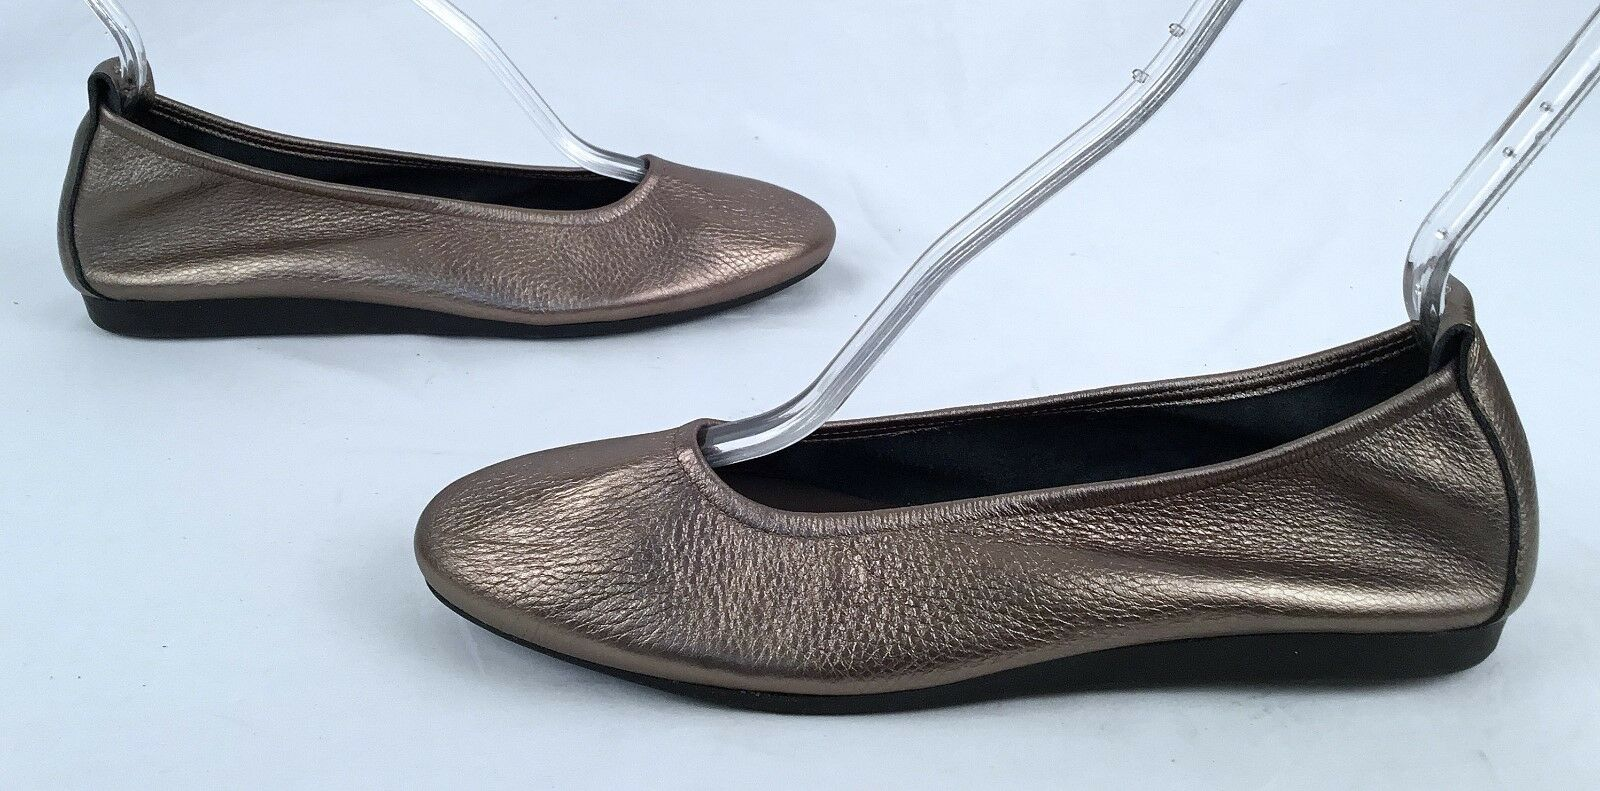 NEW   Arche 'Laius' Flat -Metallic Bronze -Taille 9 US  40 EU   295-(J7)